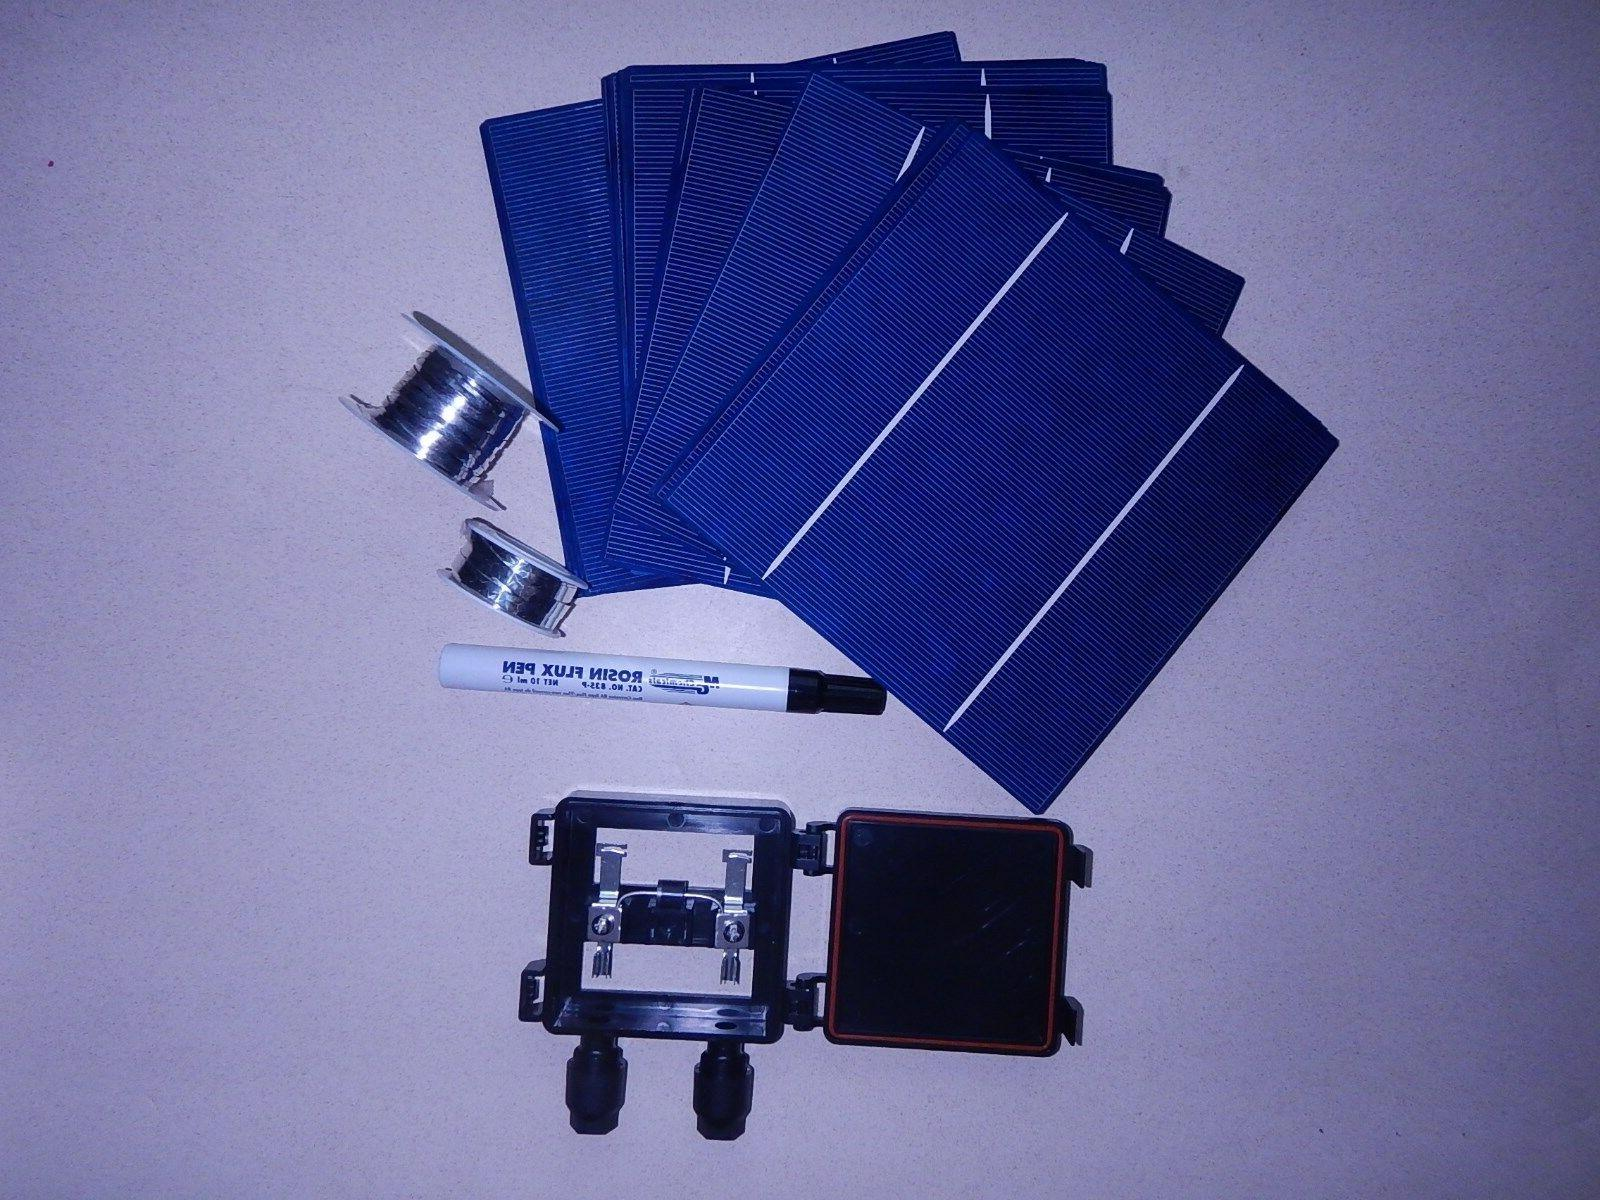 40 6x6 high efficient solar cell kit